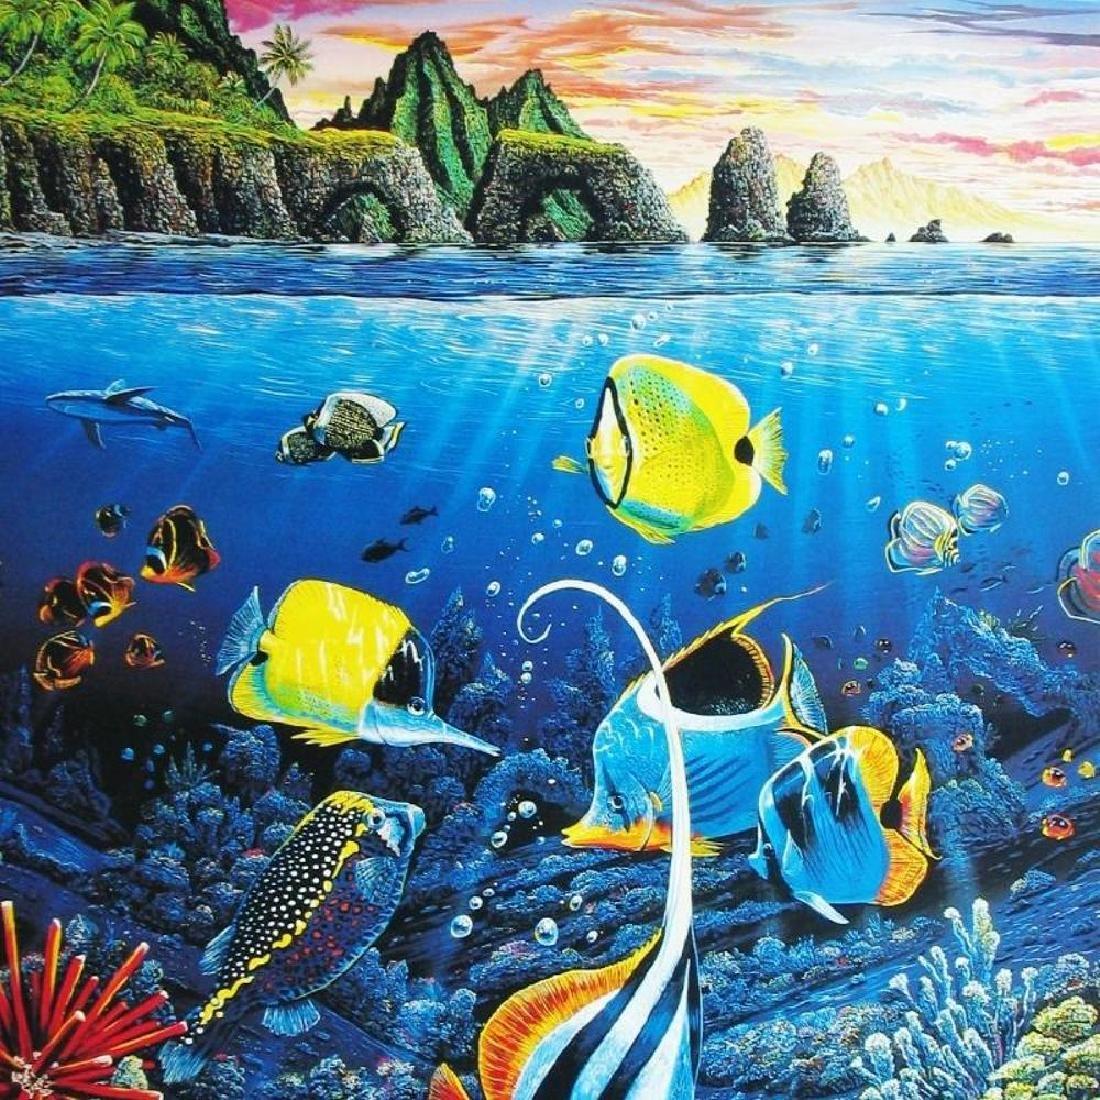 Ocean Sea Creatures Under Water Tropical Fish Scene - 3